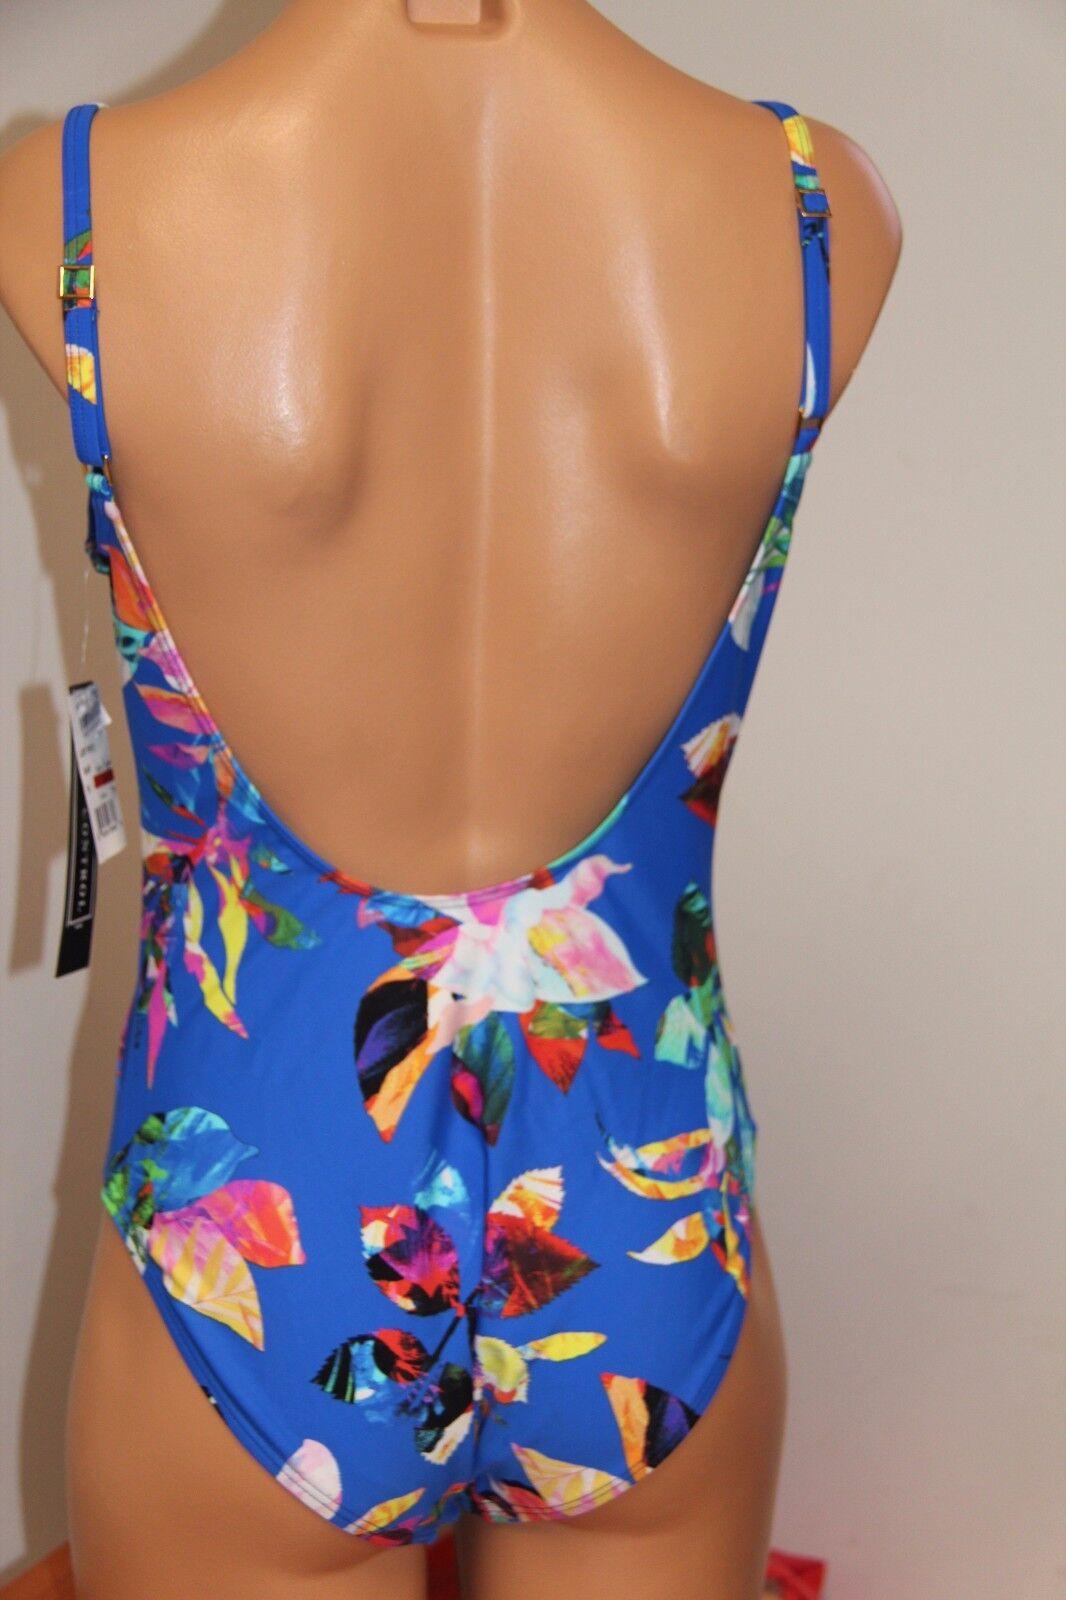 NWT La whitea Swimsuit Bikini 1 one piece Sz 6 6 6 SAP Havana Tropics 053b77